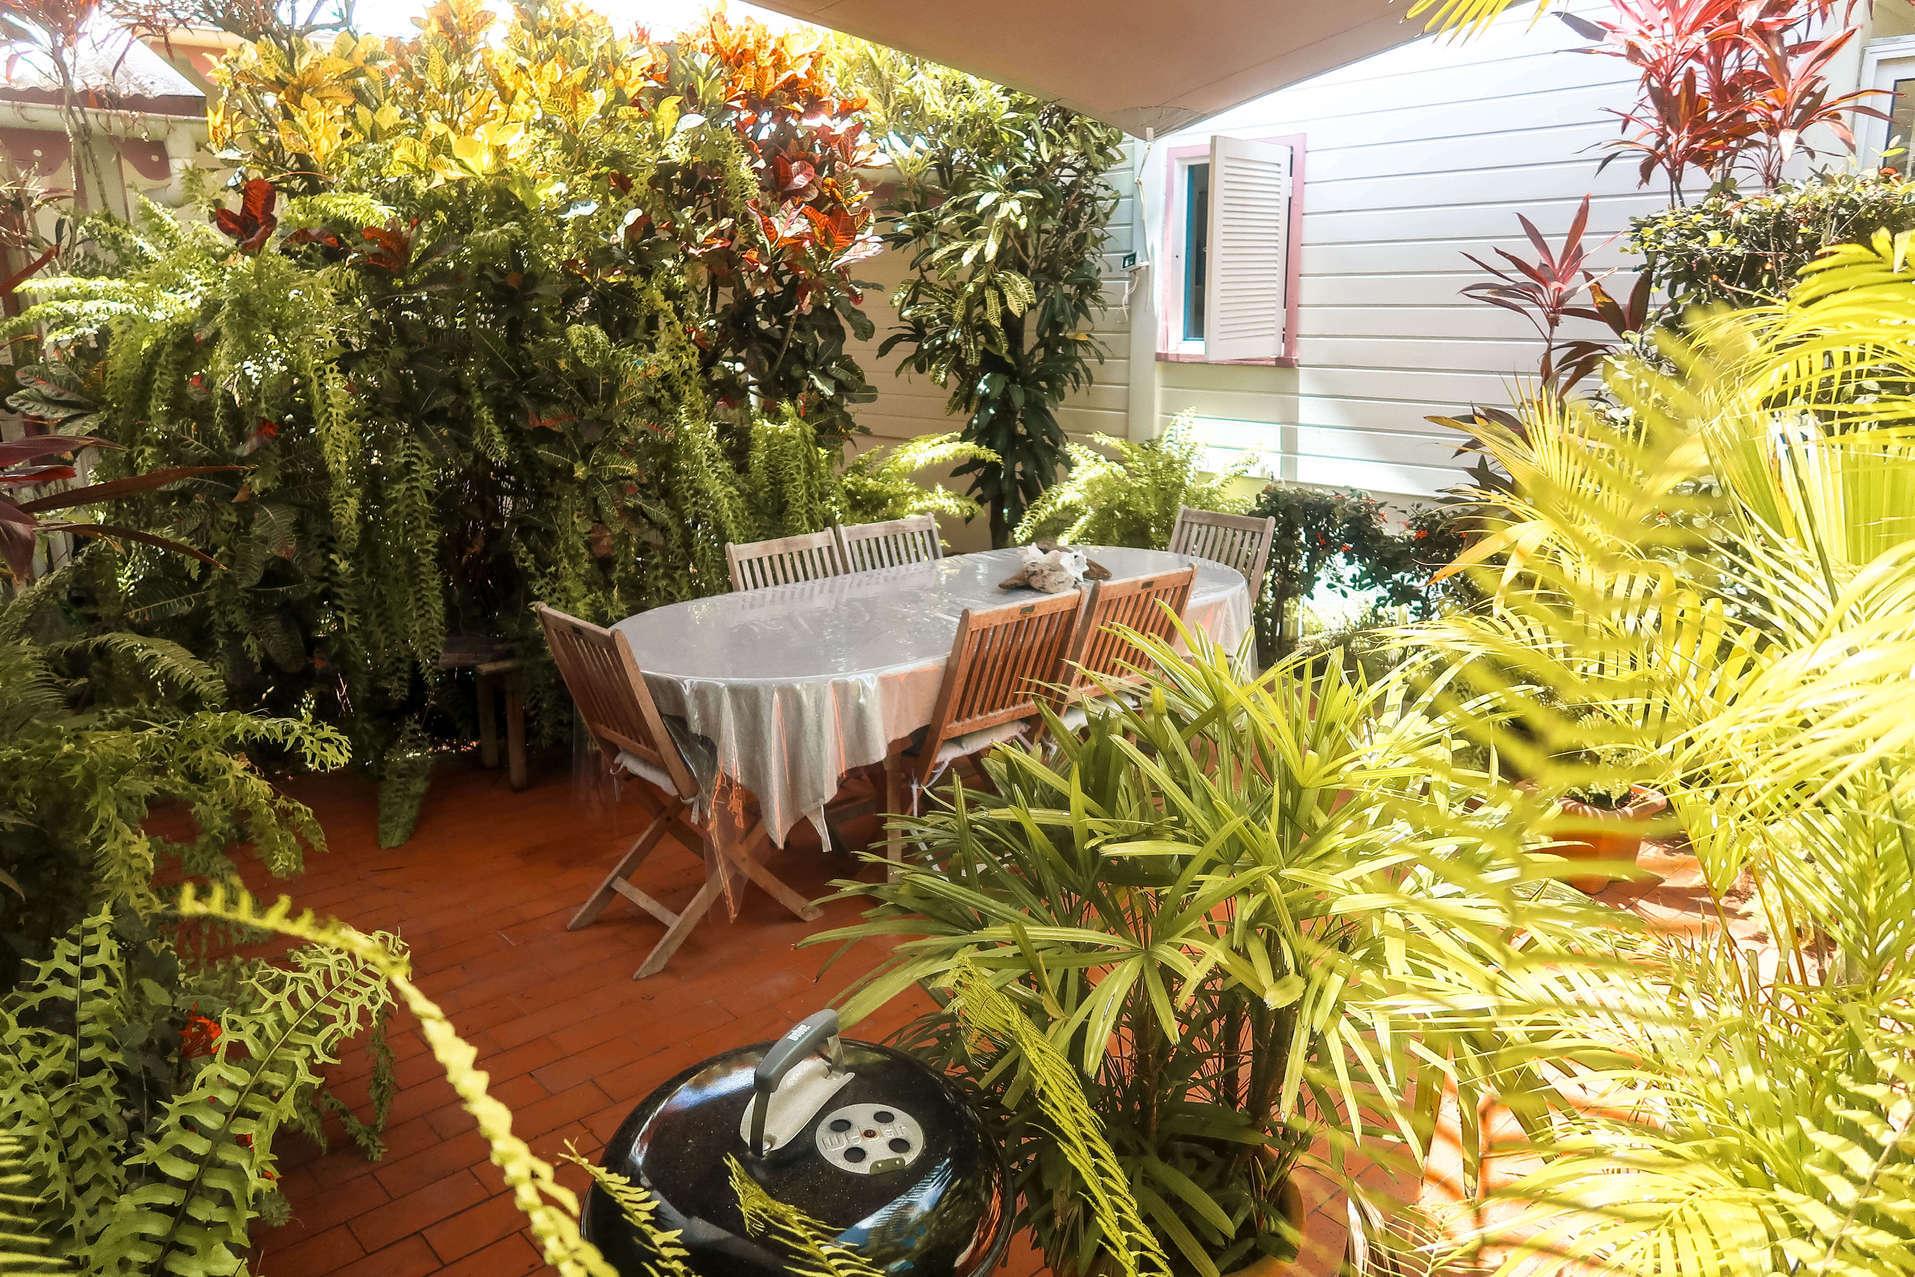 habitation-abricot-location-saisonniere-studio-espace-commun-barbecue